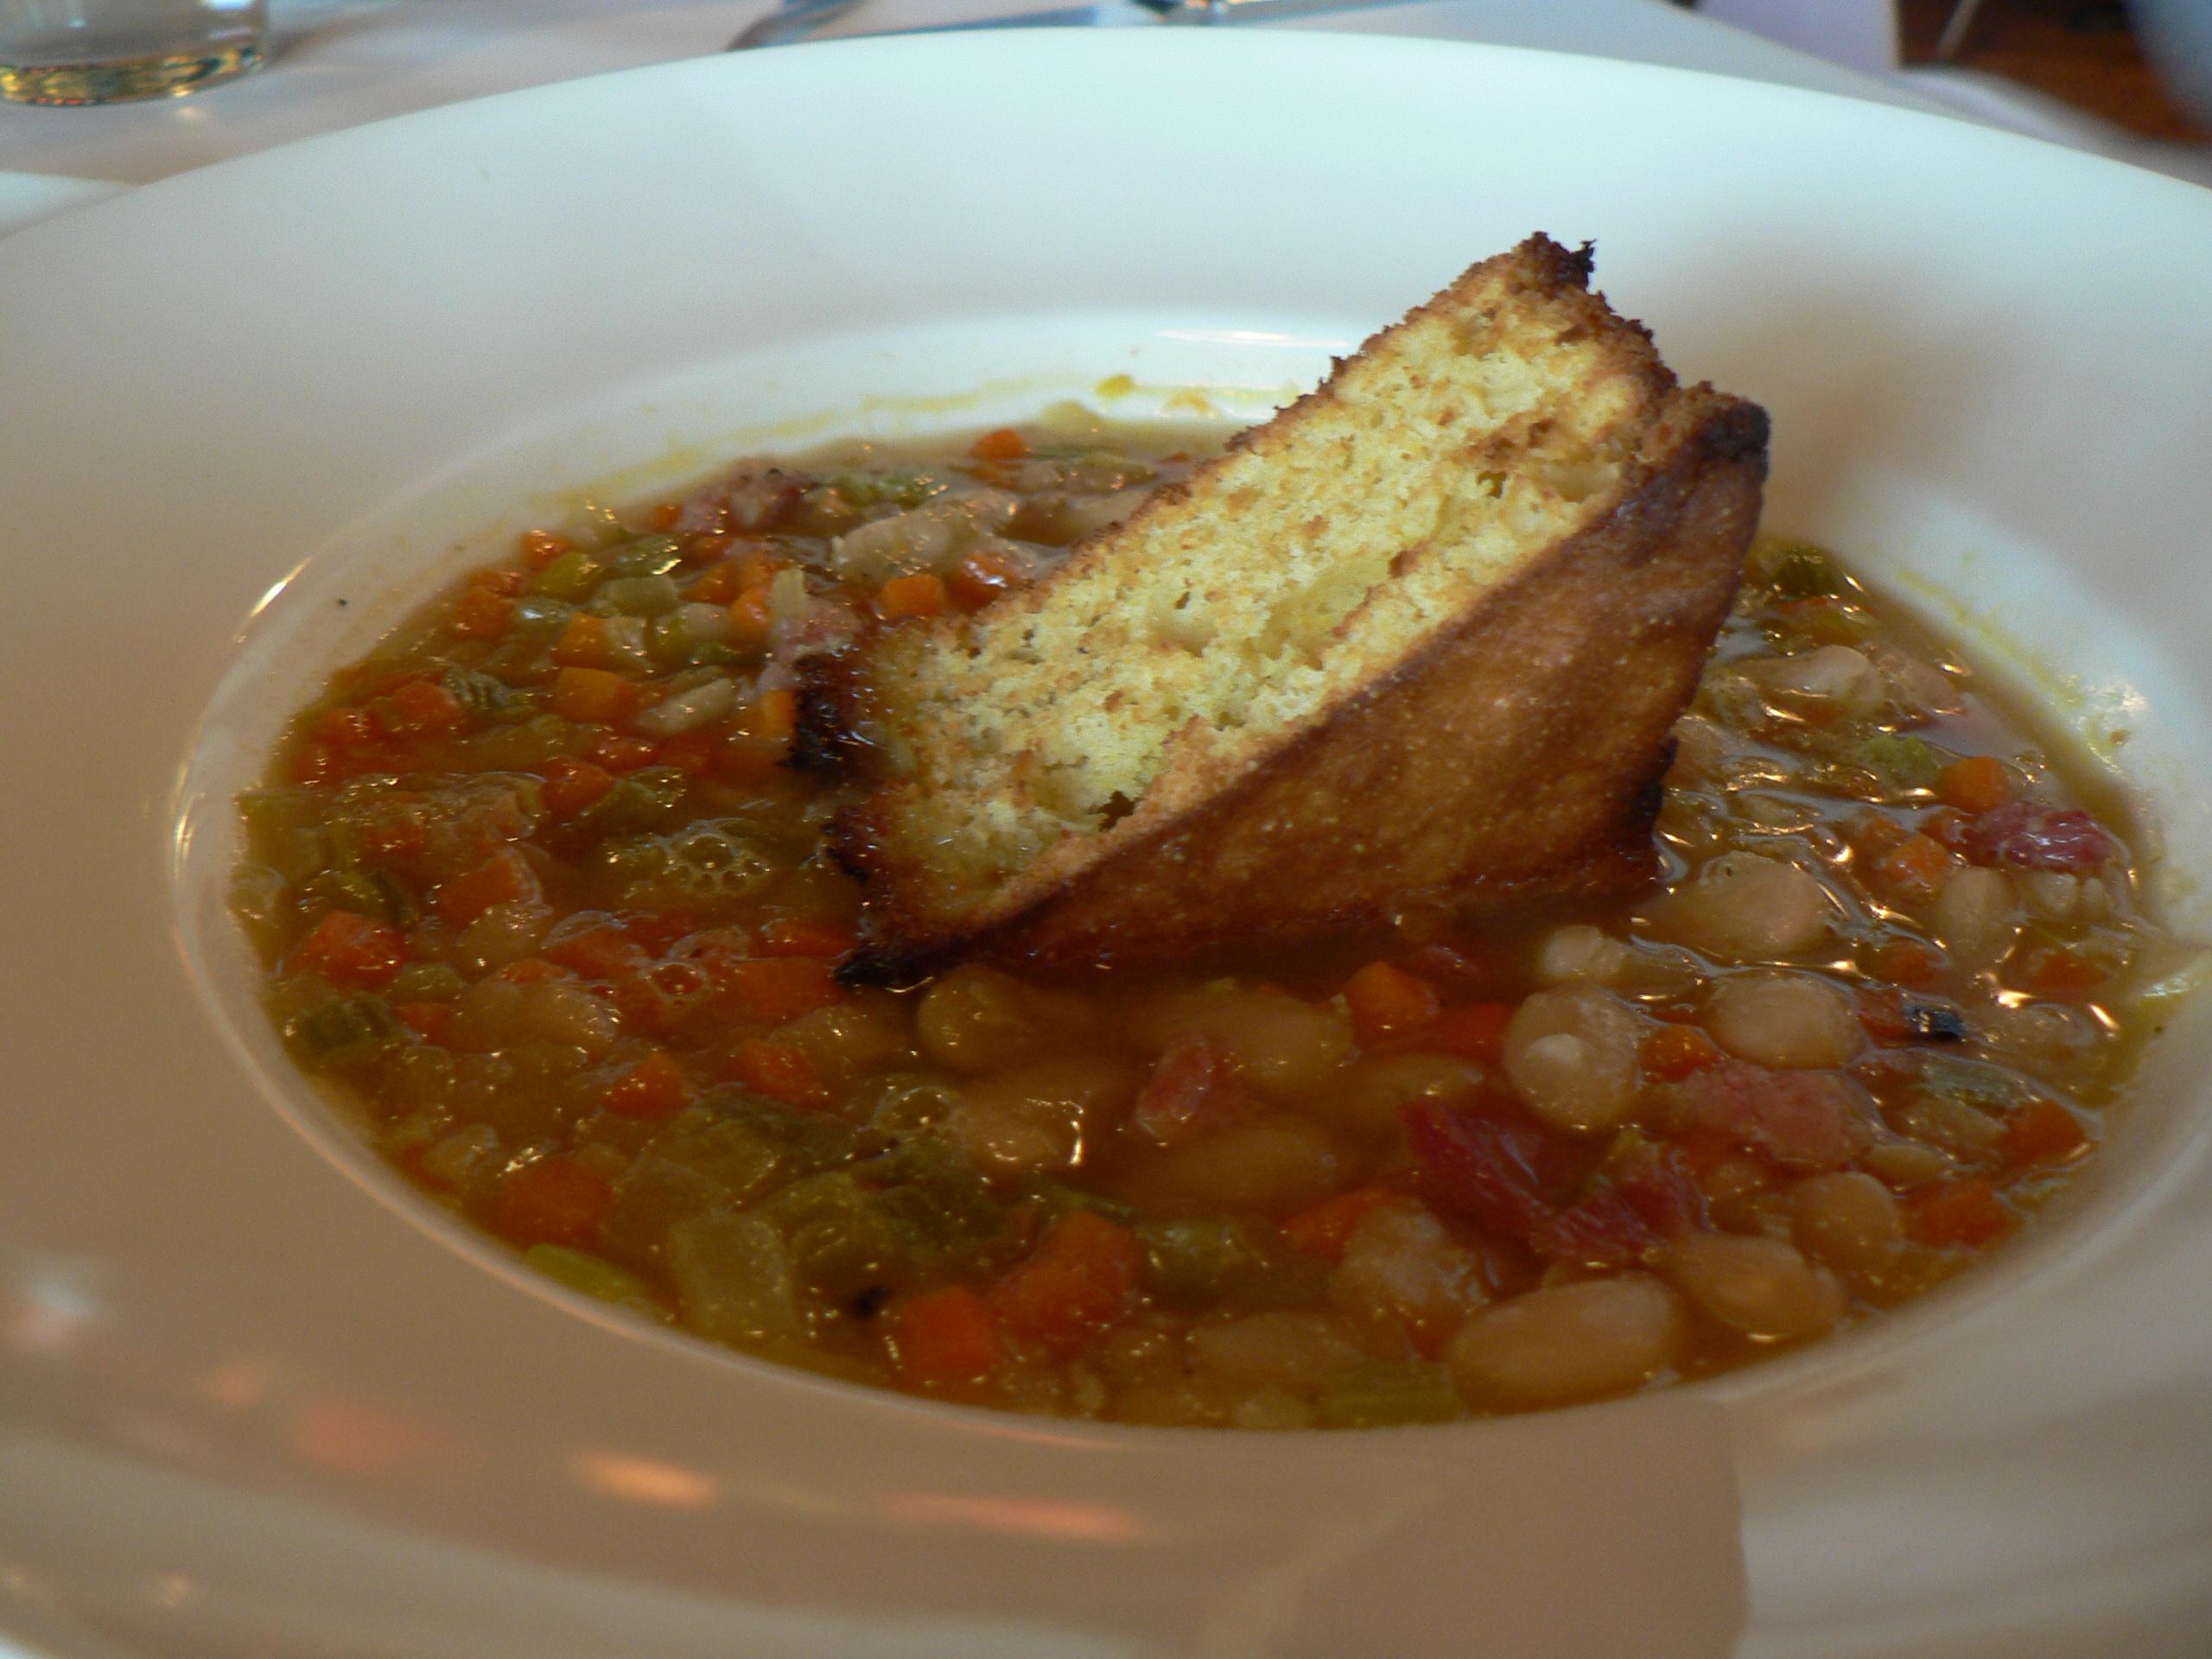 soup senate bean history senate bean soup us senate bean soup mcguire ...